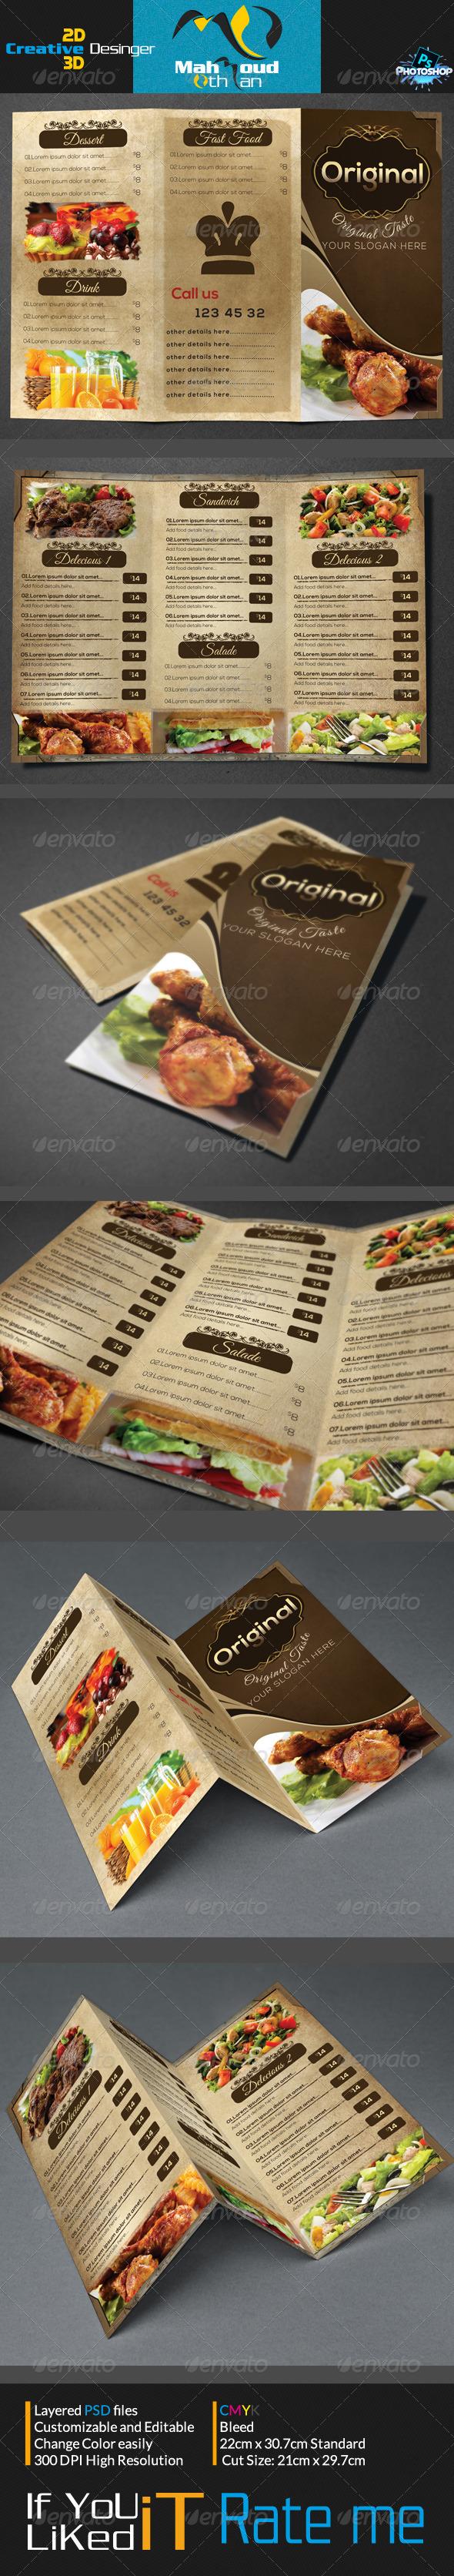 Vintage Trifold Restaurant Menu - Food Menus Print Templates